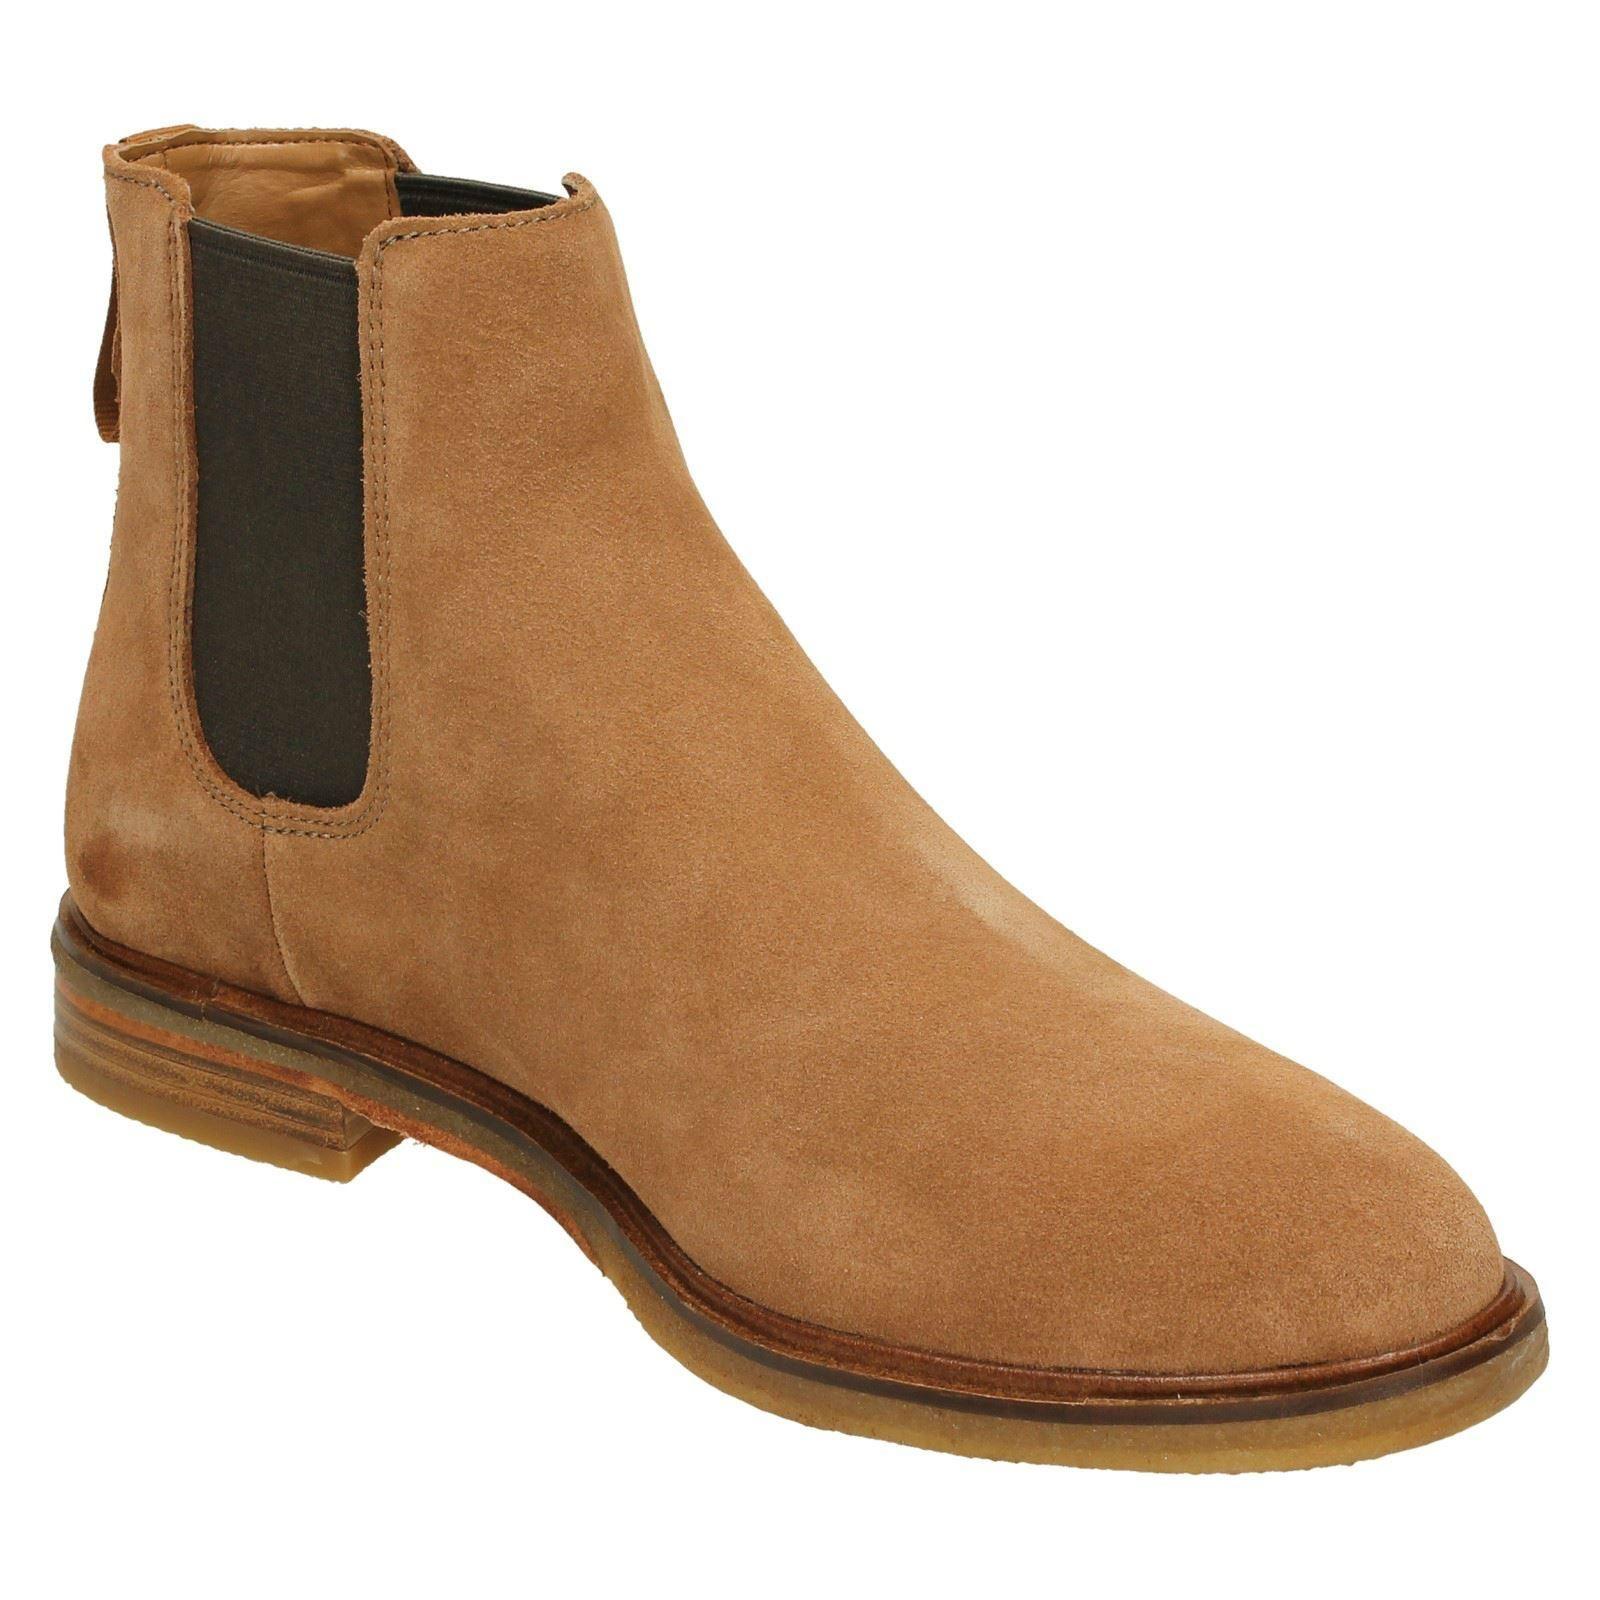 Mens Clarks Chelsea Boots *Clarkdale Gobi*